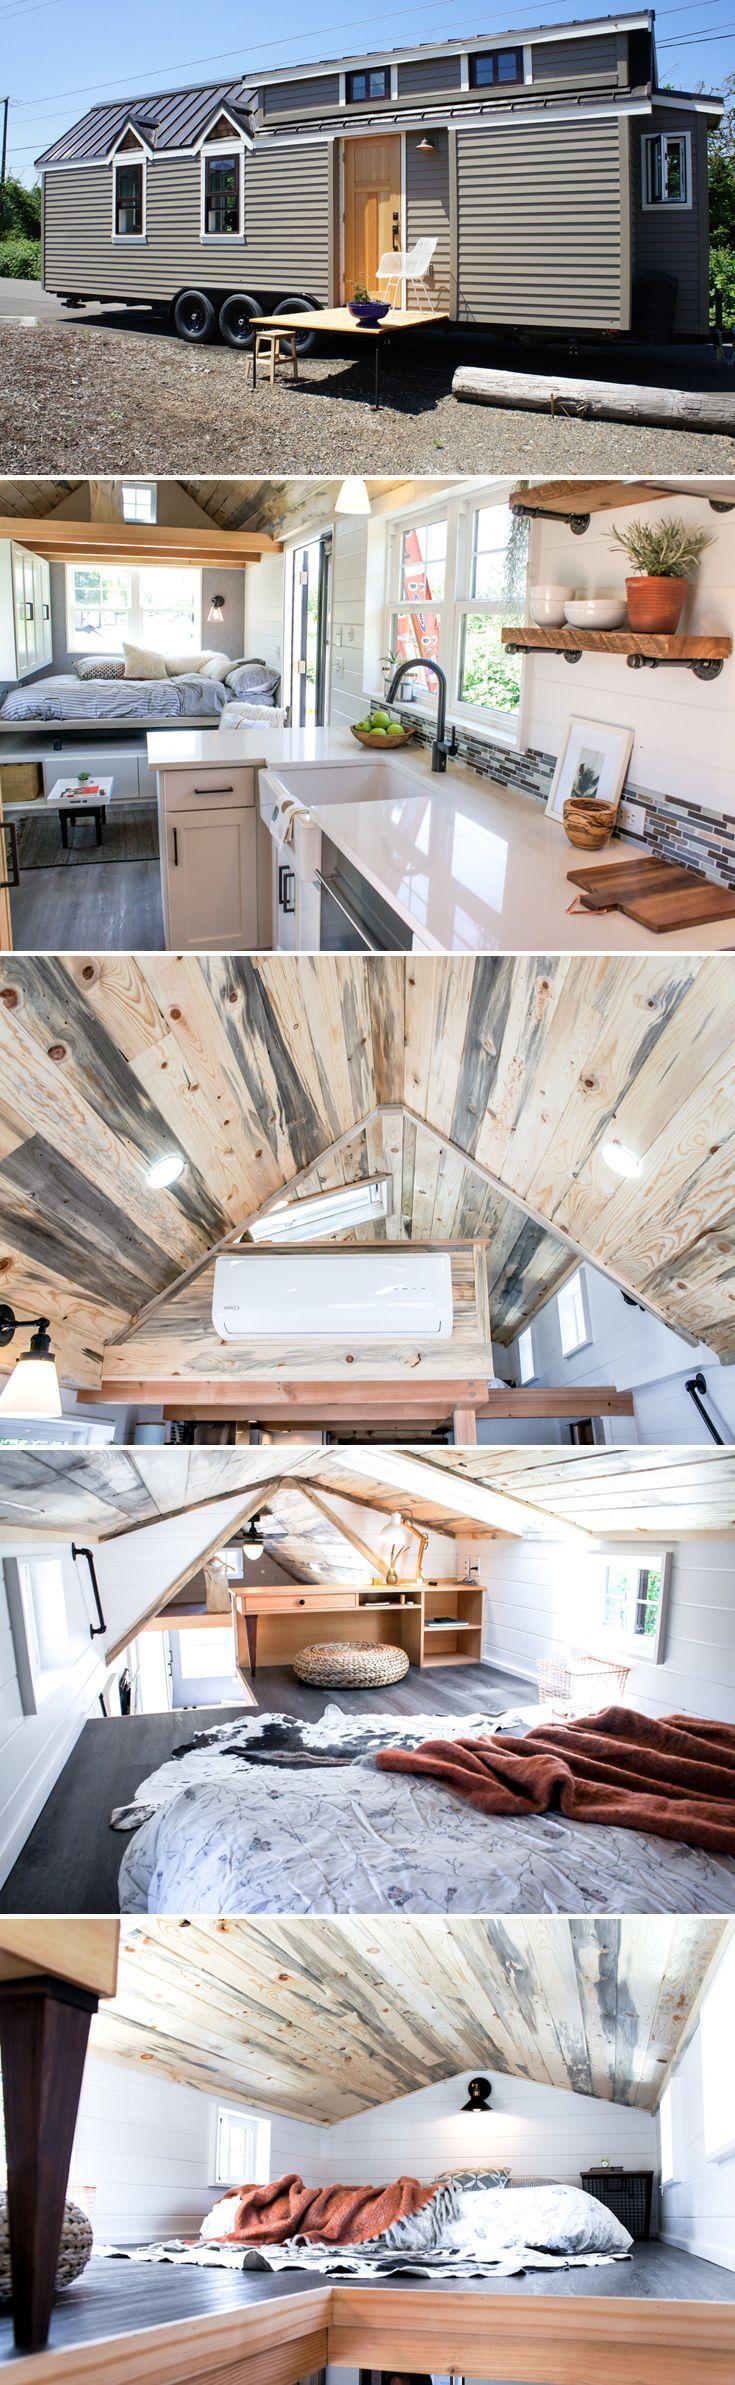 3 bedroom loft house  The Kootenay Country is a u tiny house featuring a main floor